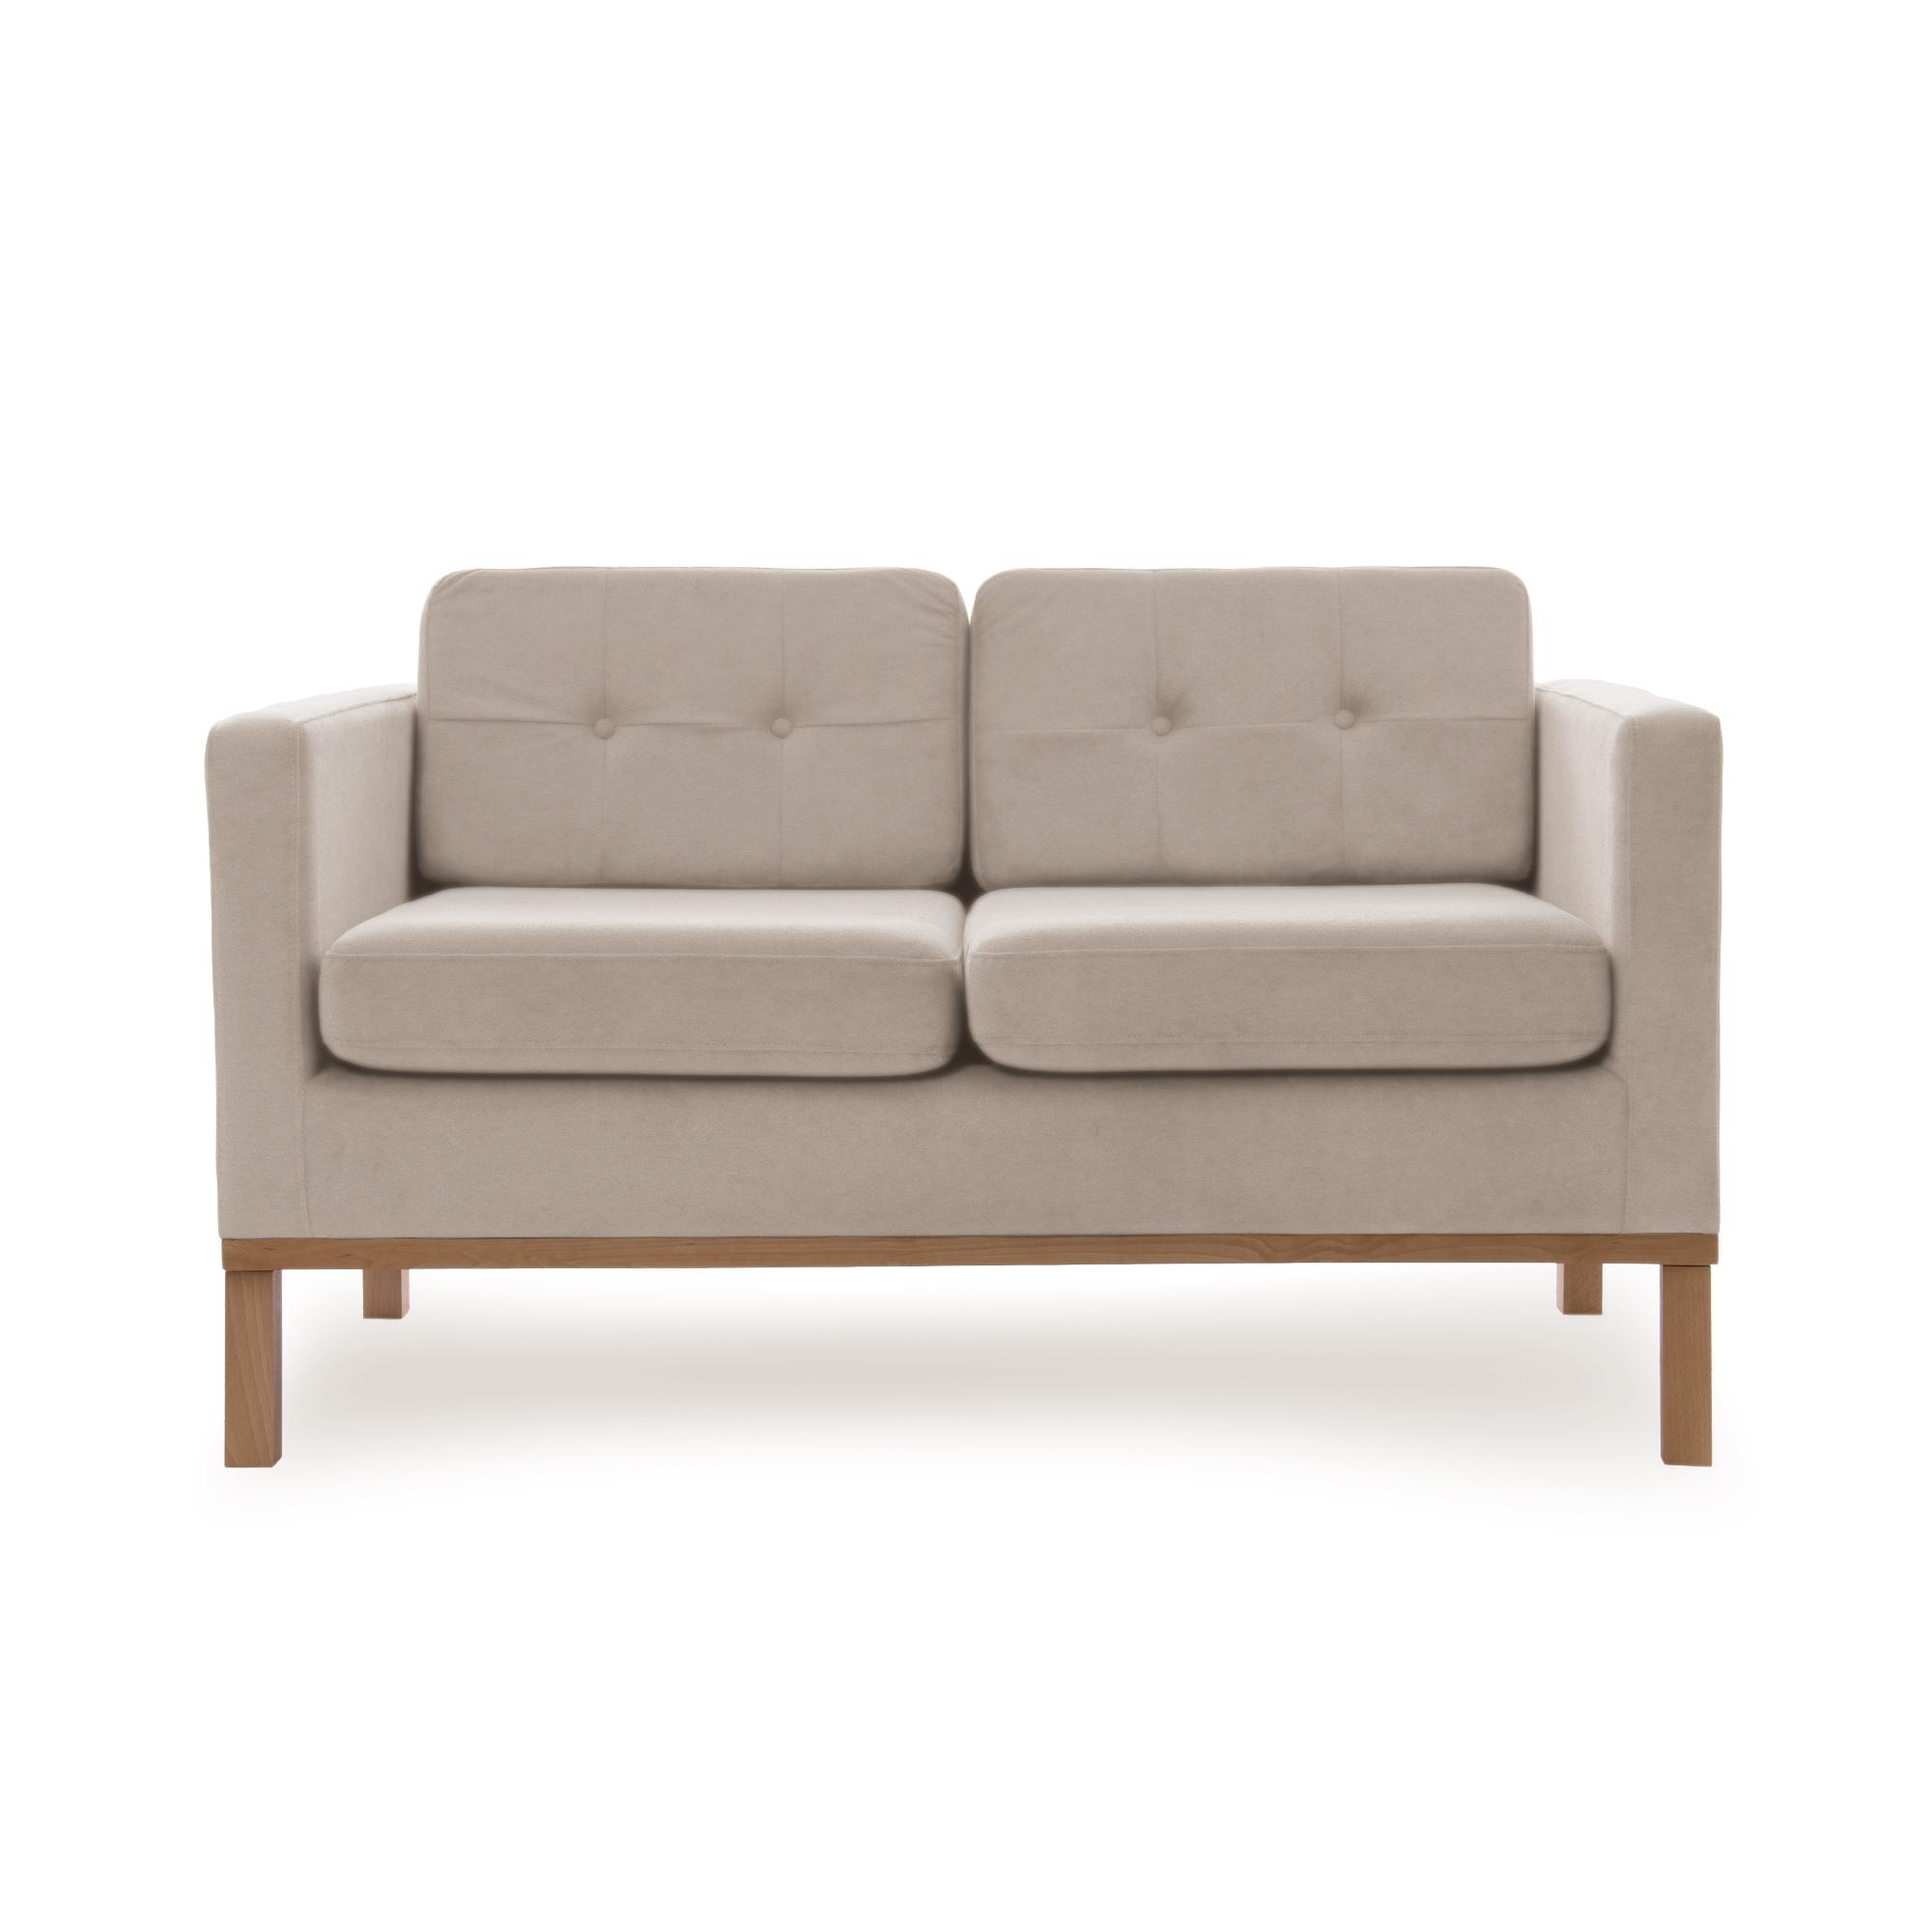 Canapea Fixa 2 locuri Jonan Beige/Natural